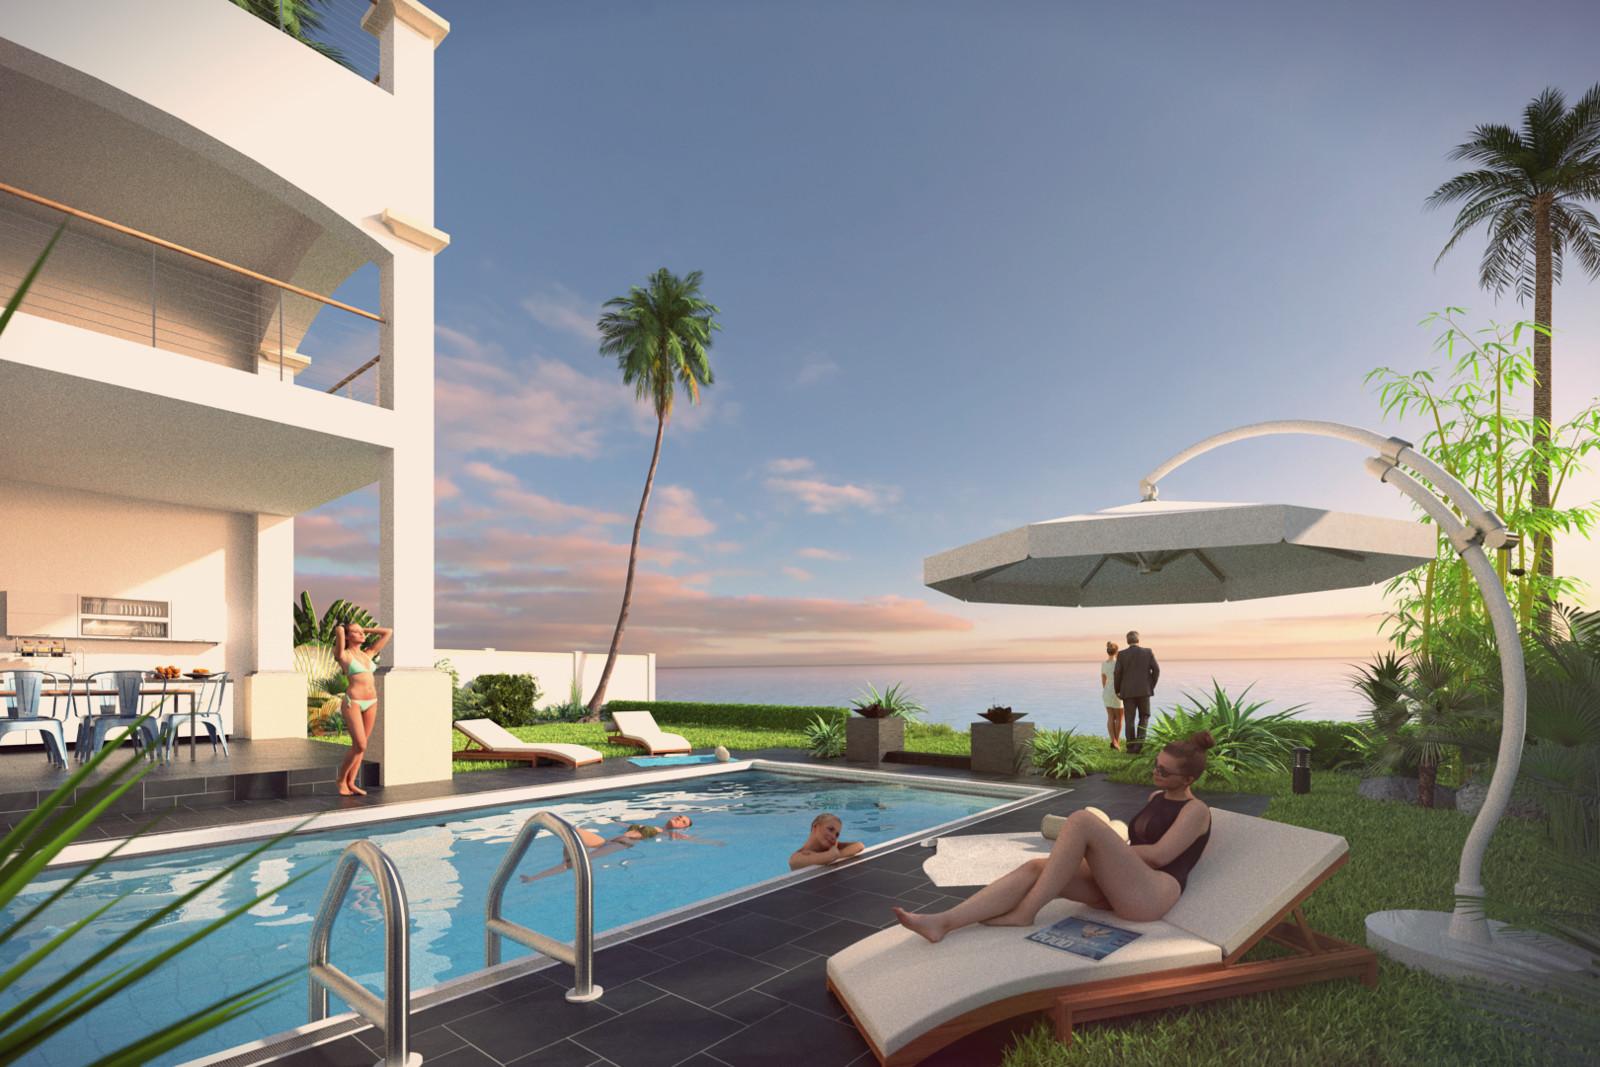 SketchUp + Thea Render  Seagrove Beach House: Poolside 02 3-2 Day B Karl Early 1620 × 1080 Presto MC Bucket